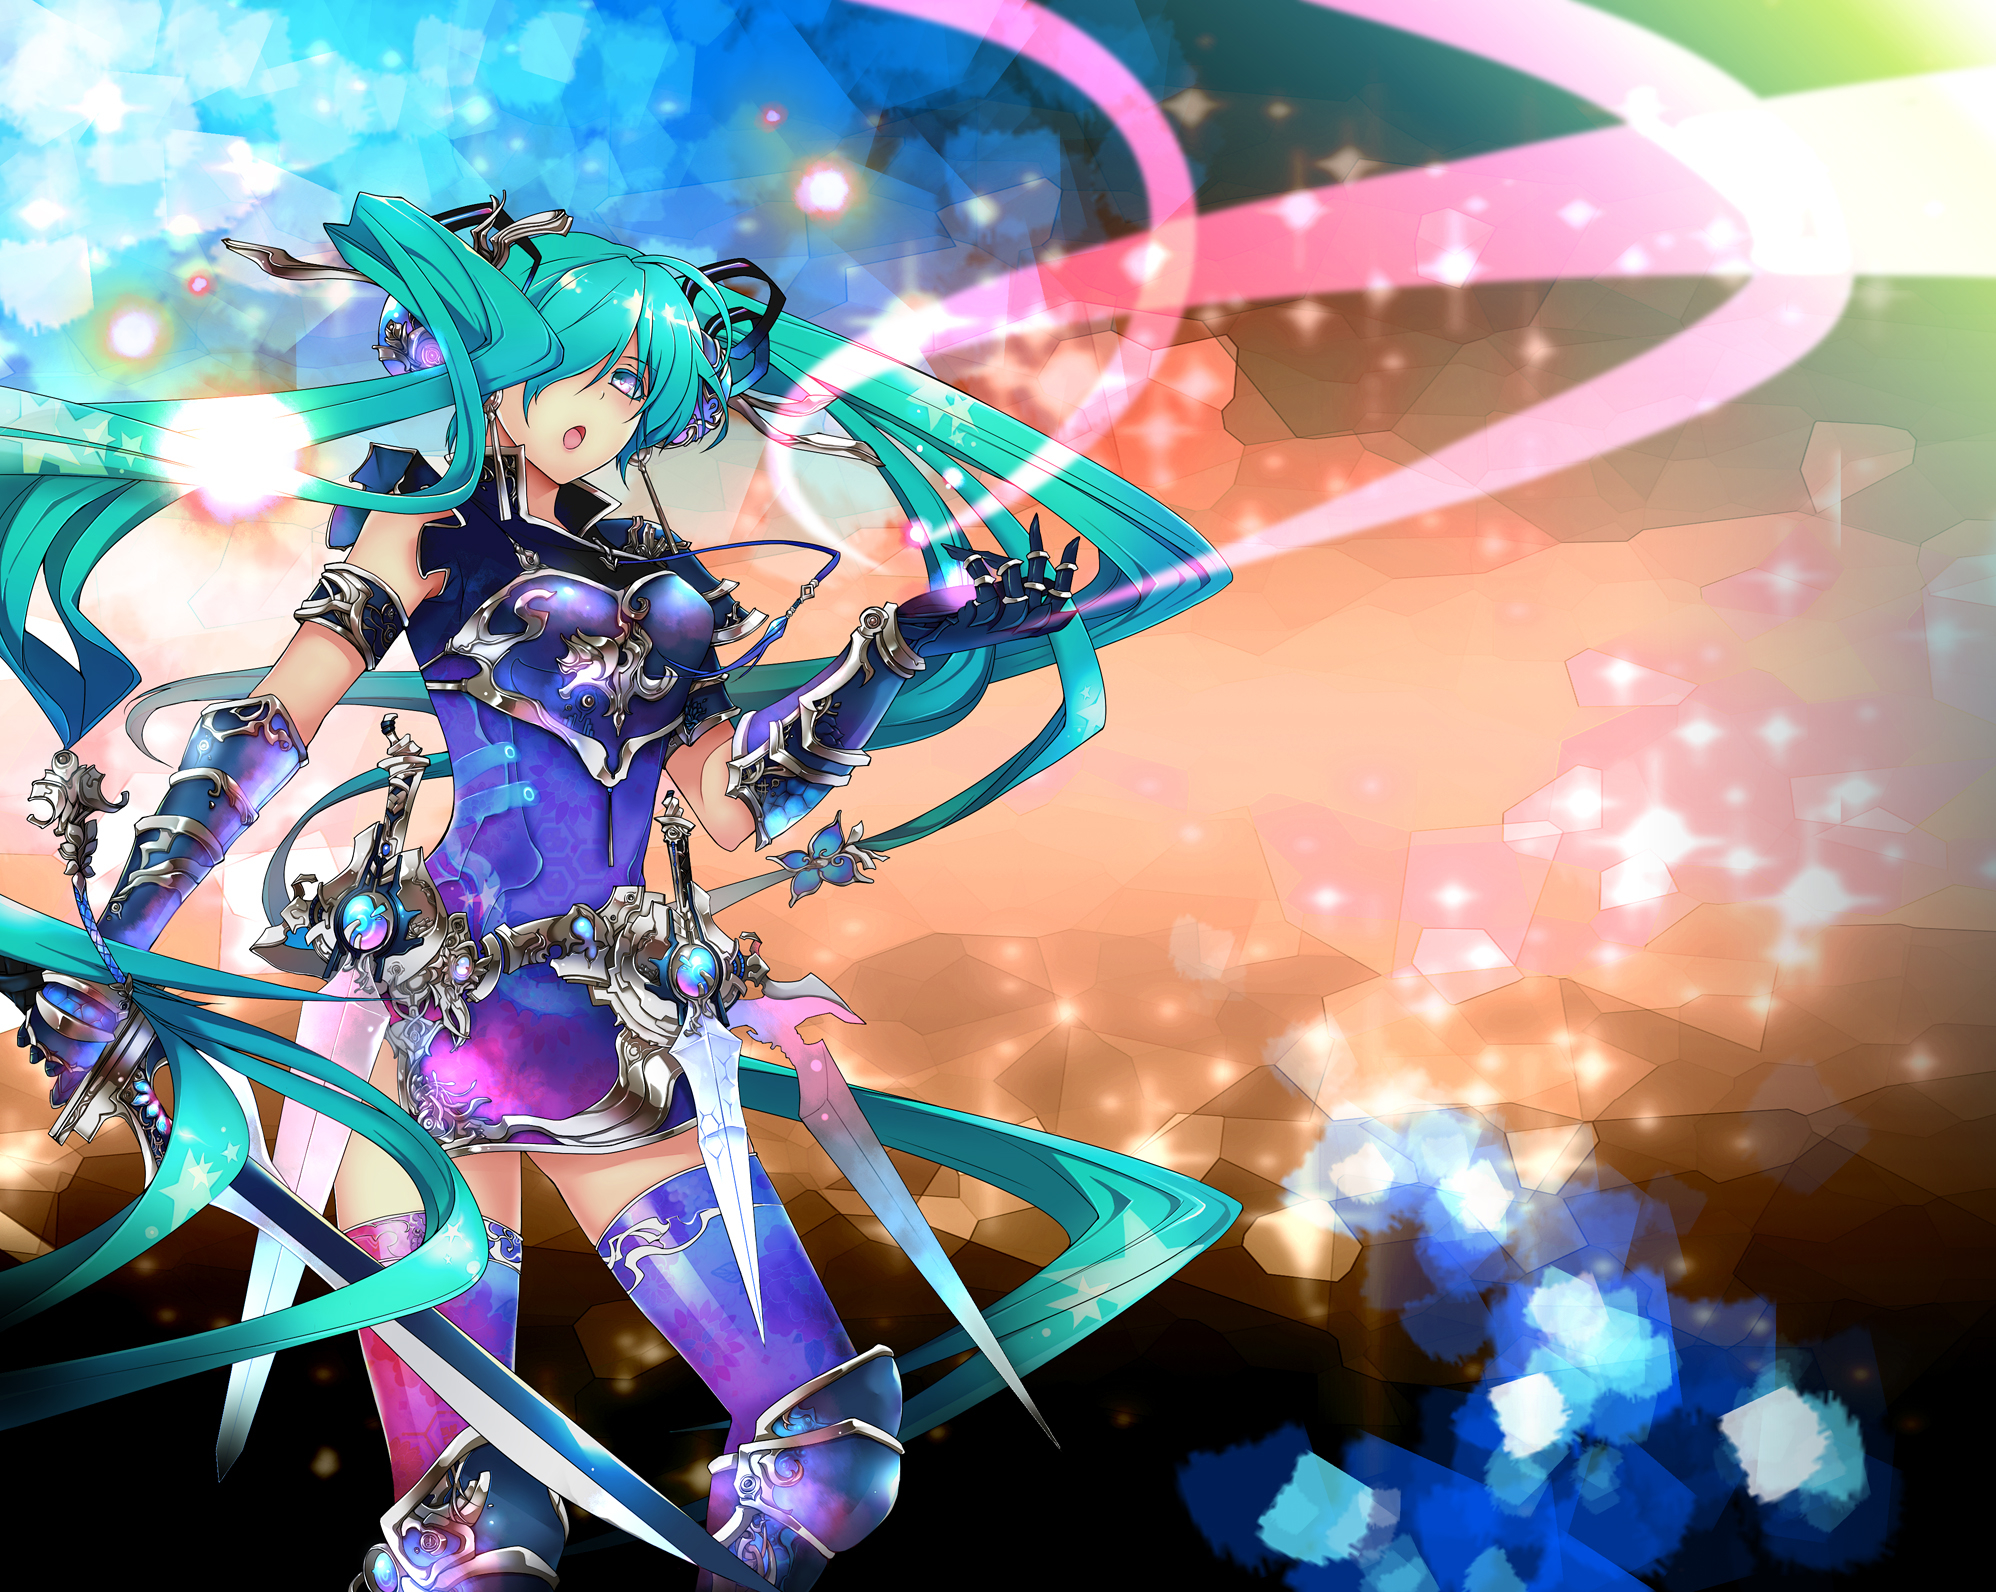 armor ene0 hatsune_miku sword twintails vocaloid weapon